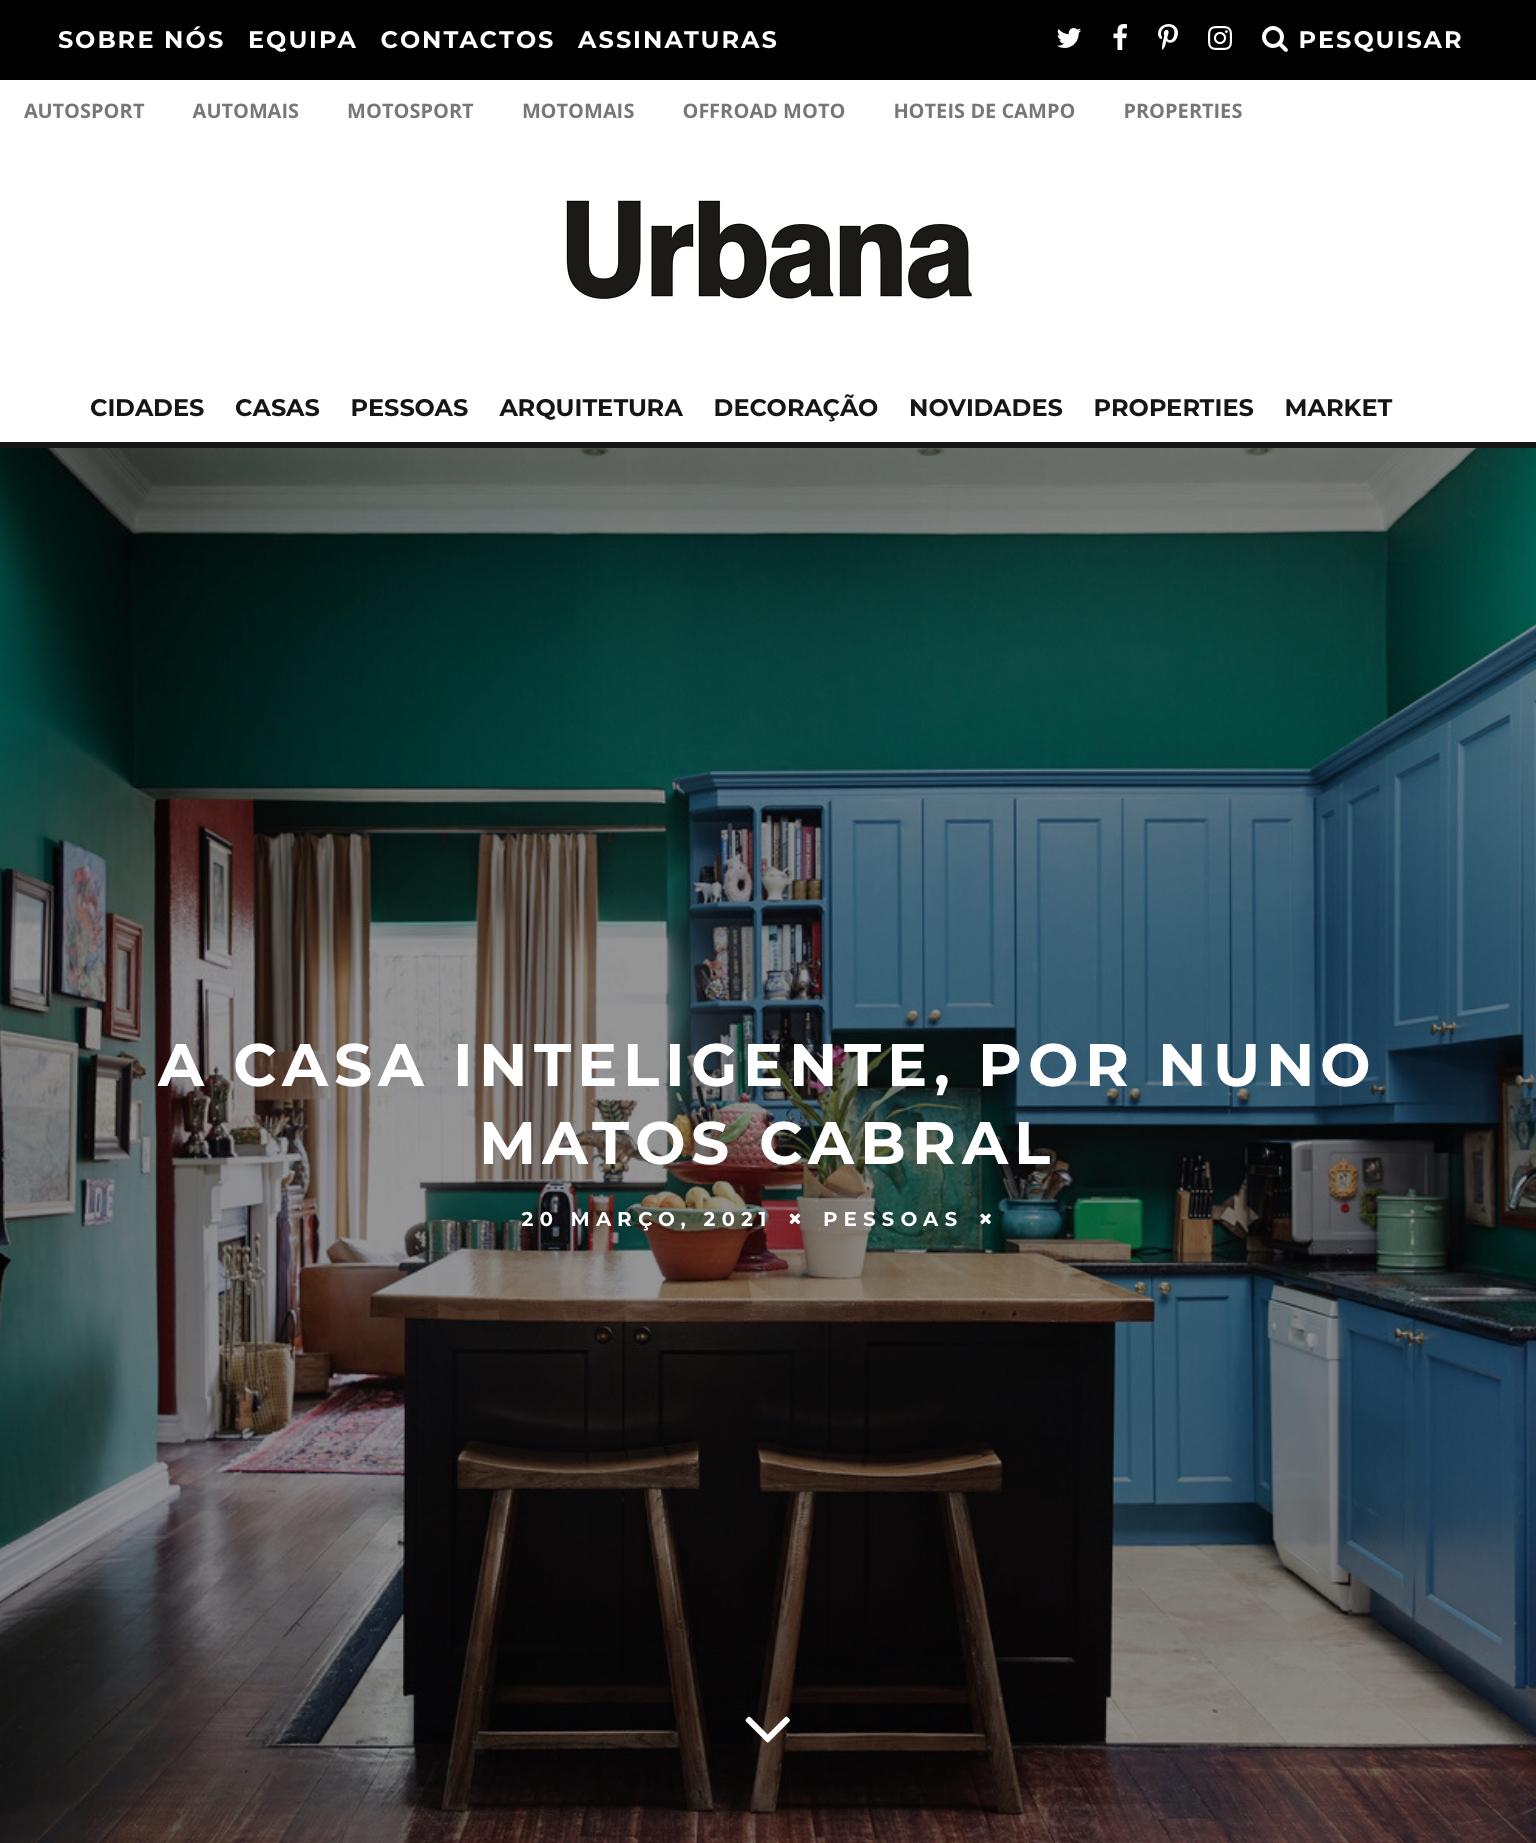 Nuno Matos Cabral @ Urbana